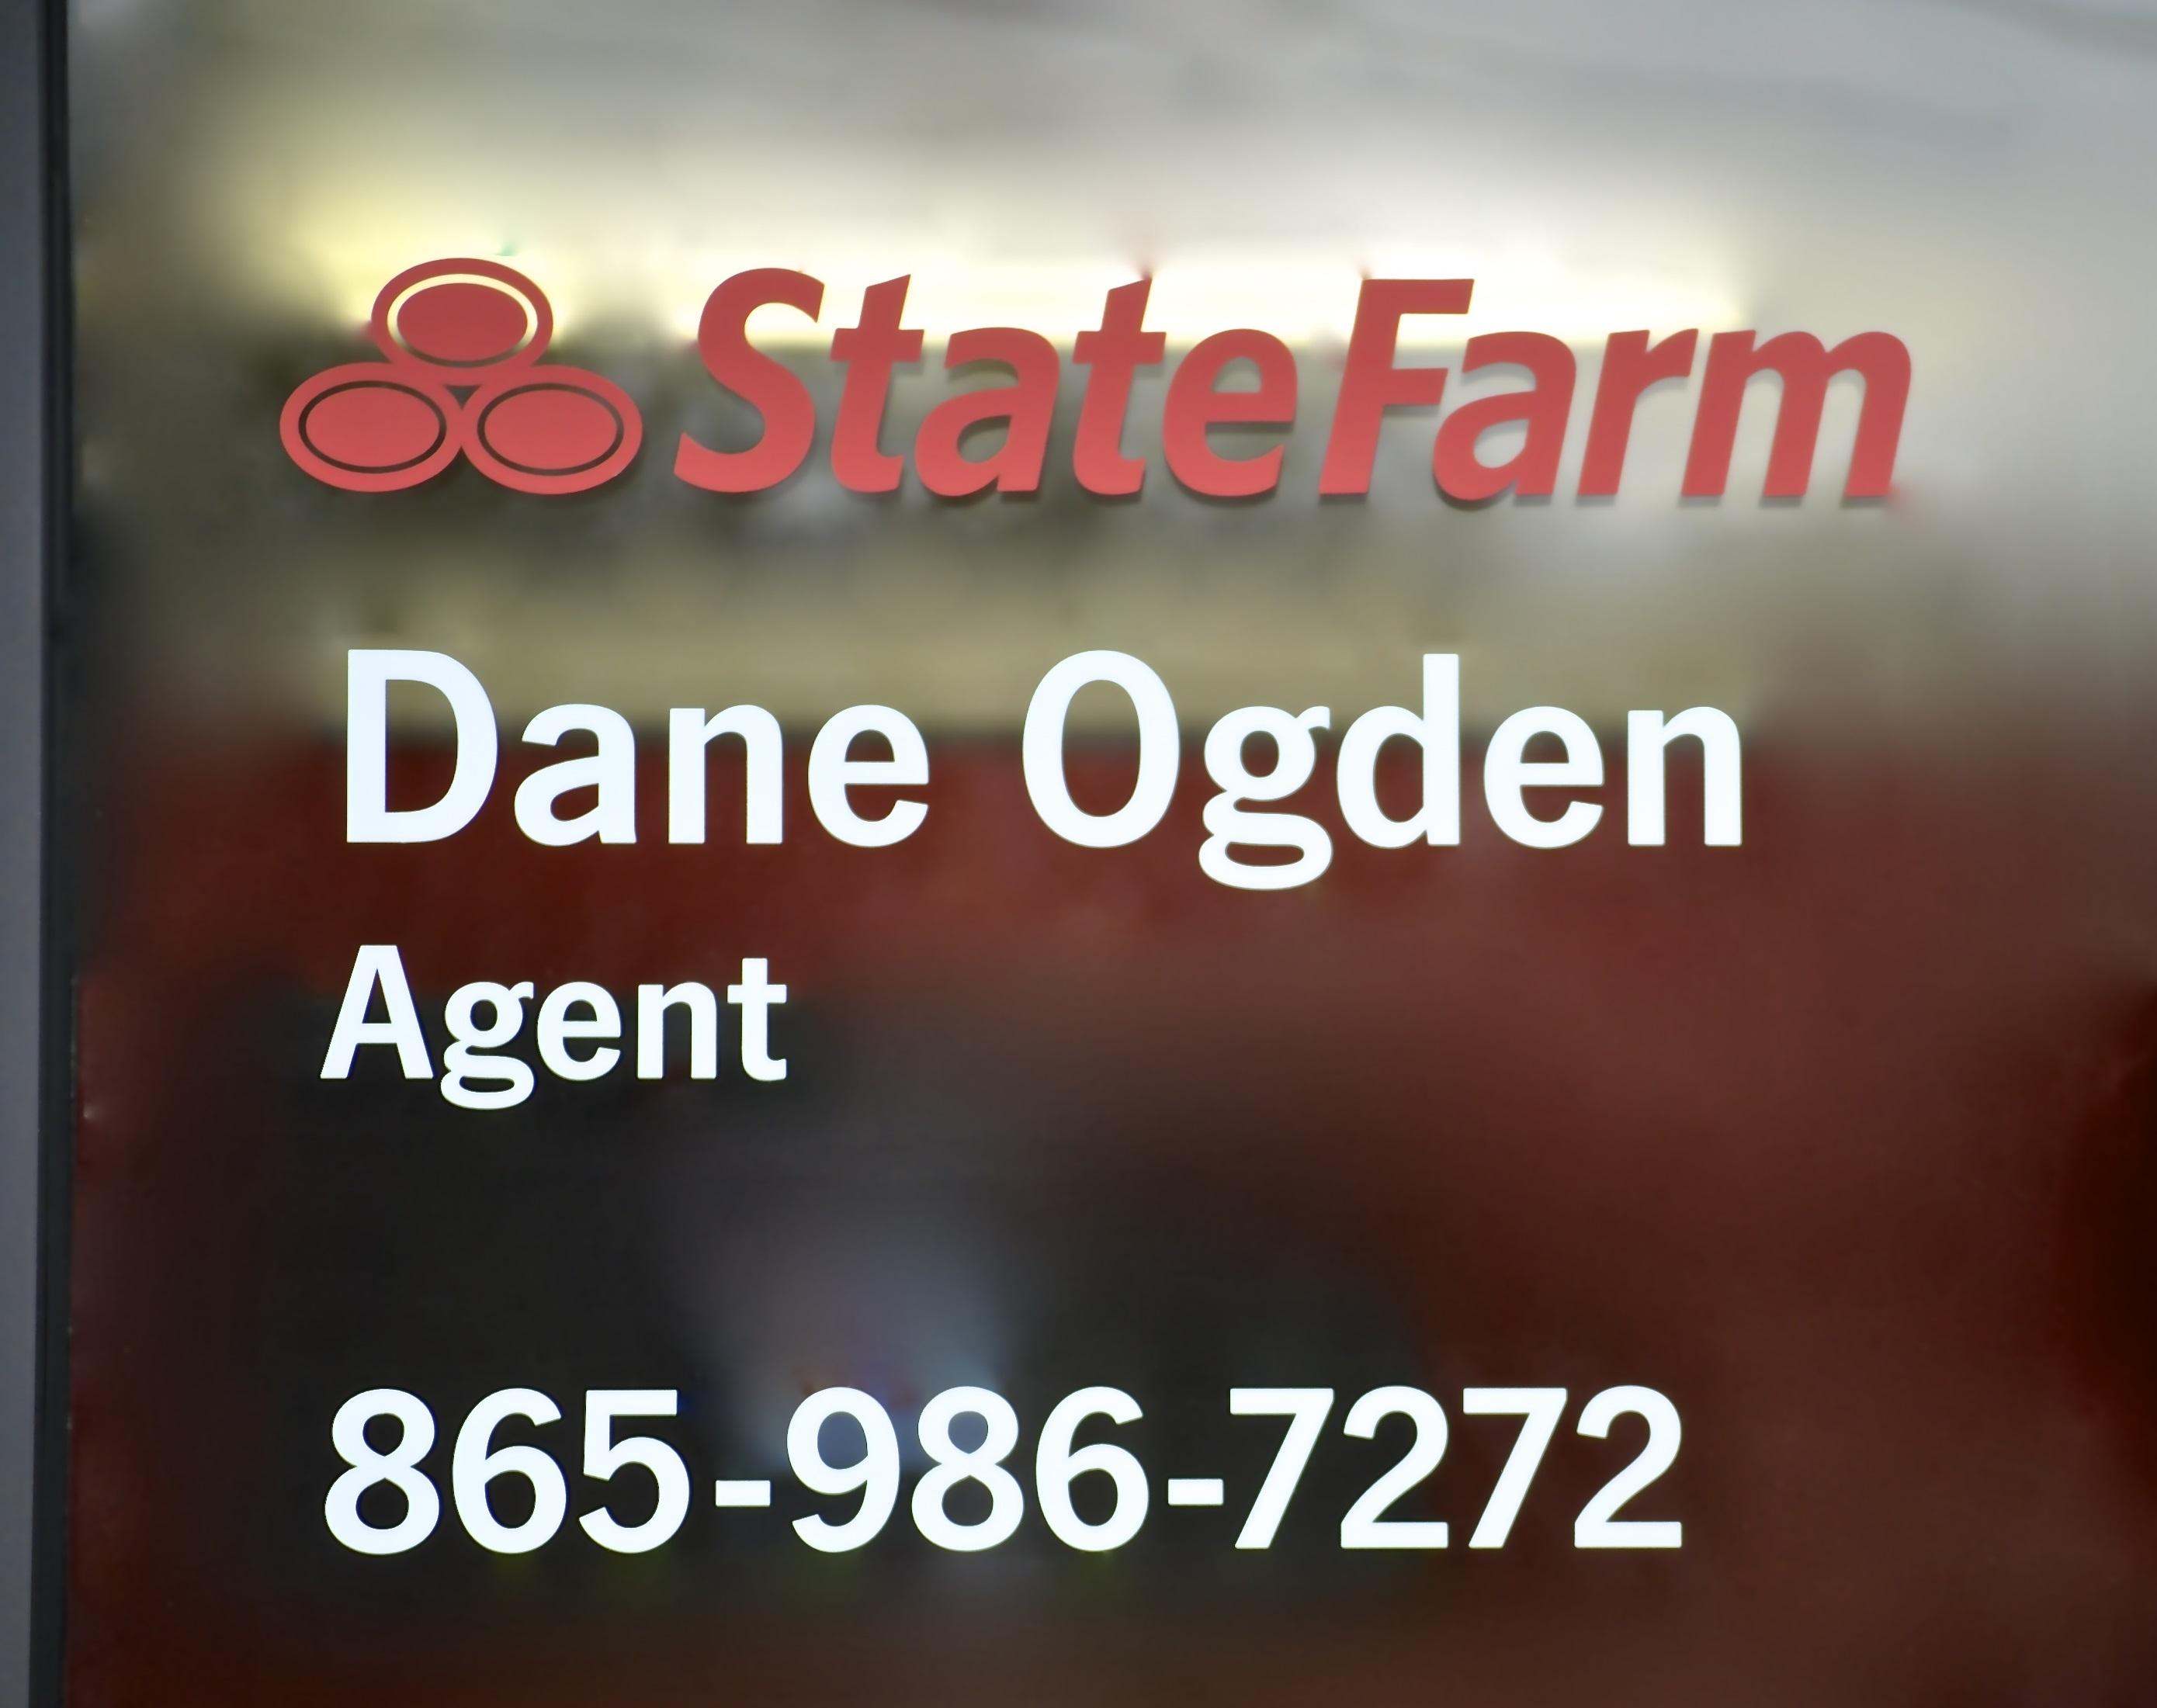 Dane Ogden - State Farm Agent